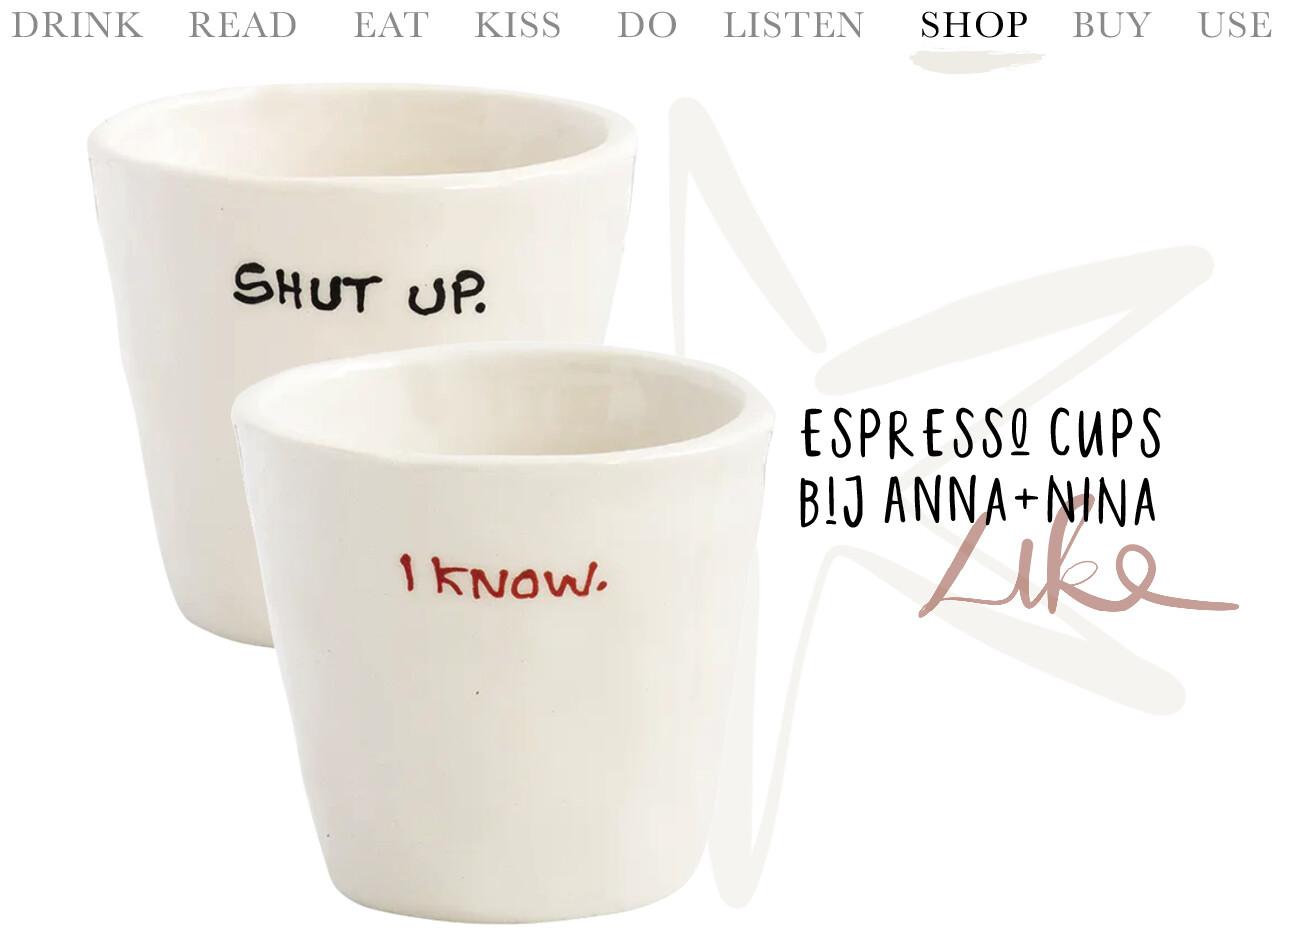 Anna+Nina espresso cups